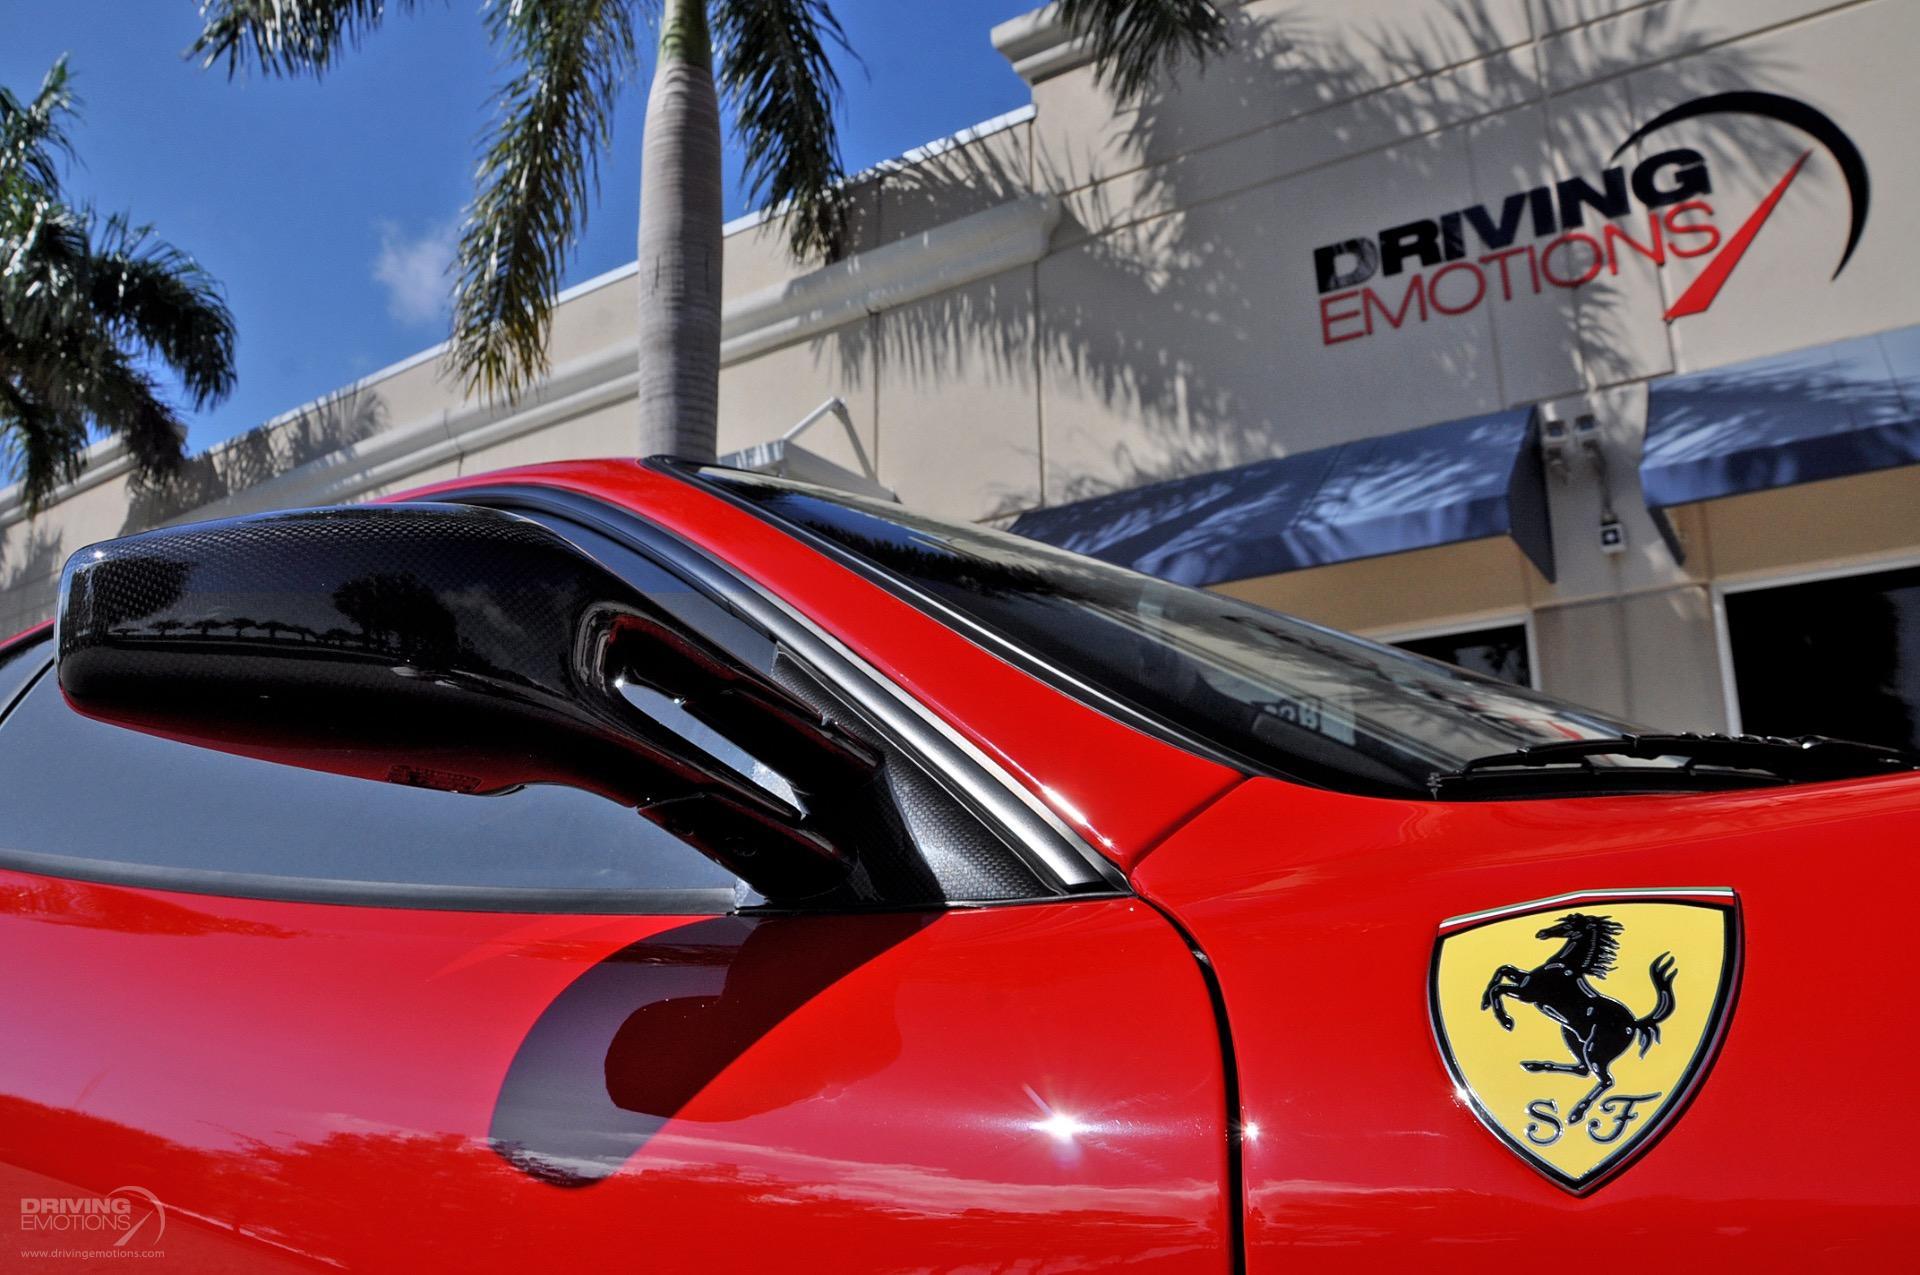 2009 Ferrari F430 Scuderia Spider 16M Scuderia Spider 16M Stock ...